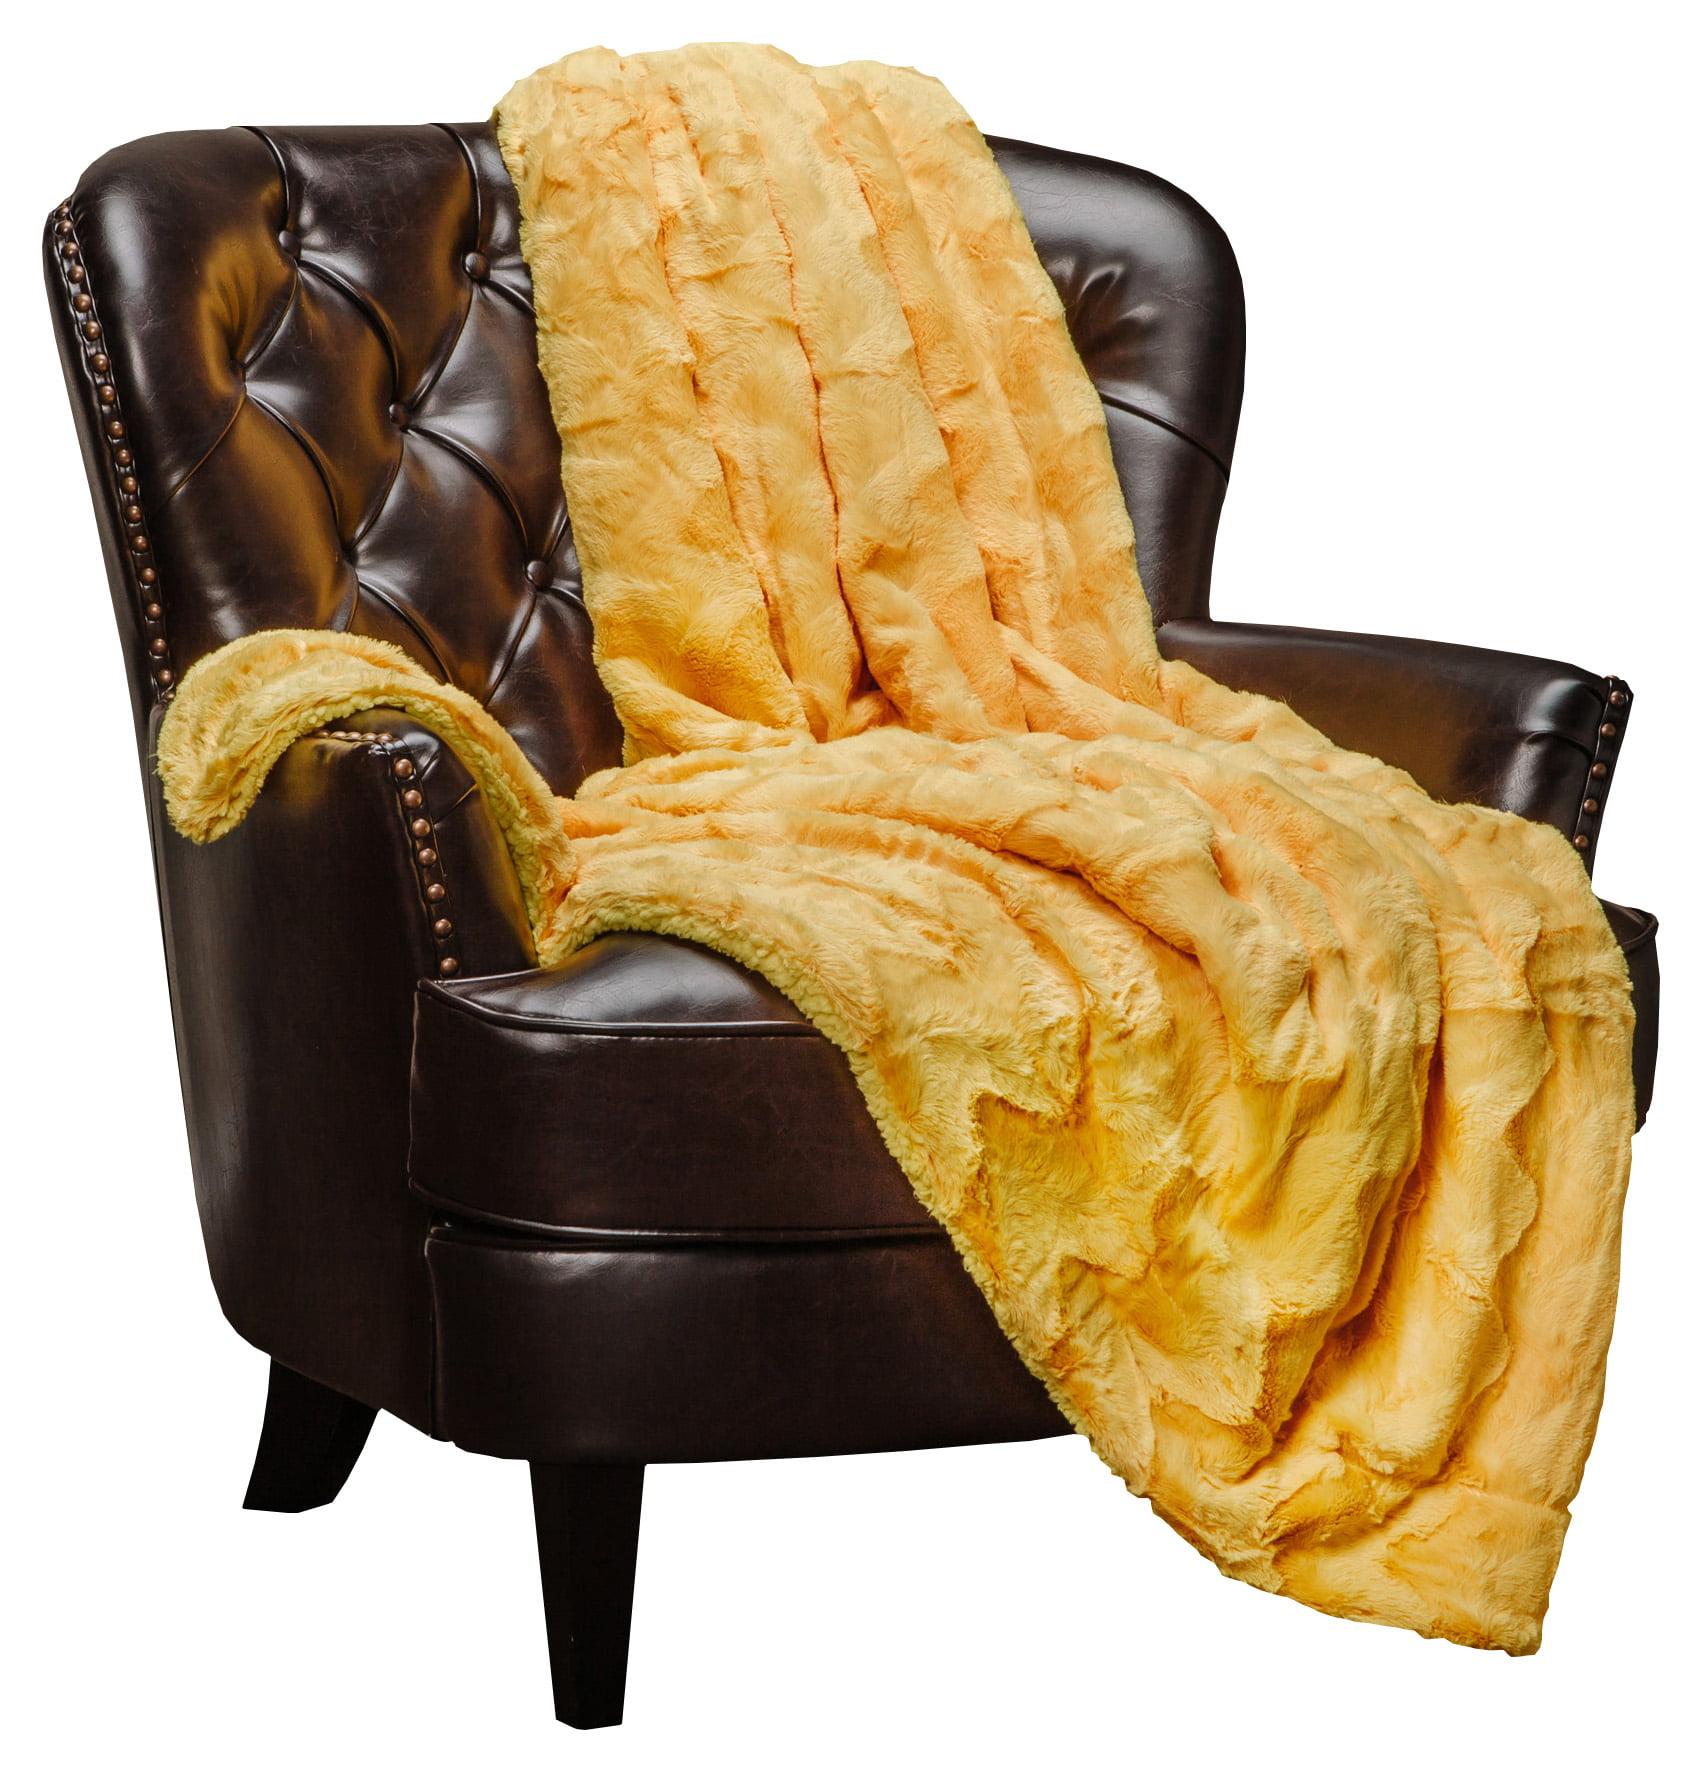 Chanasya Super Soft Warm Elegent Waivey Pattern Cozy Sherpa Throw Blanket